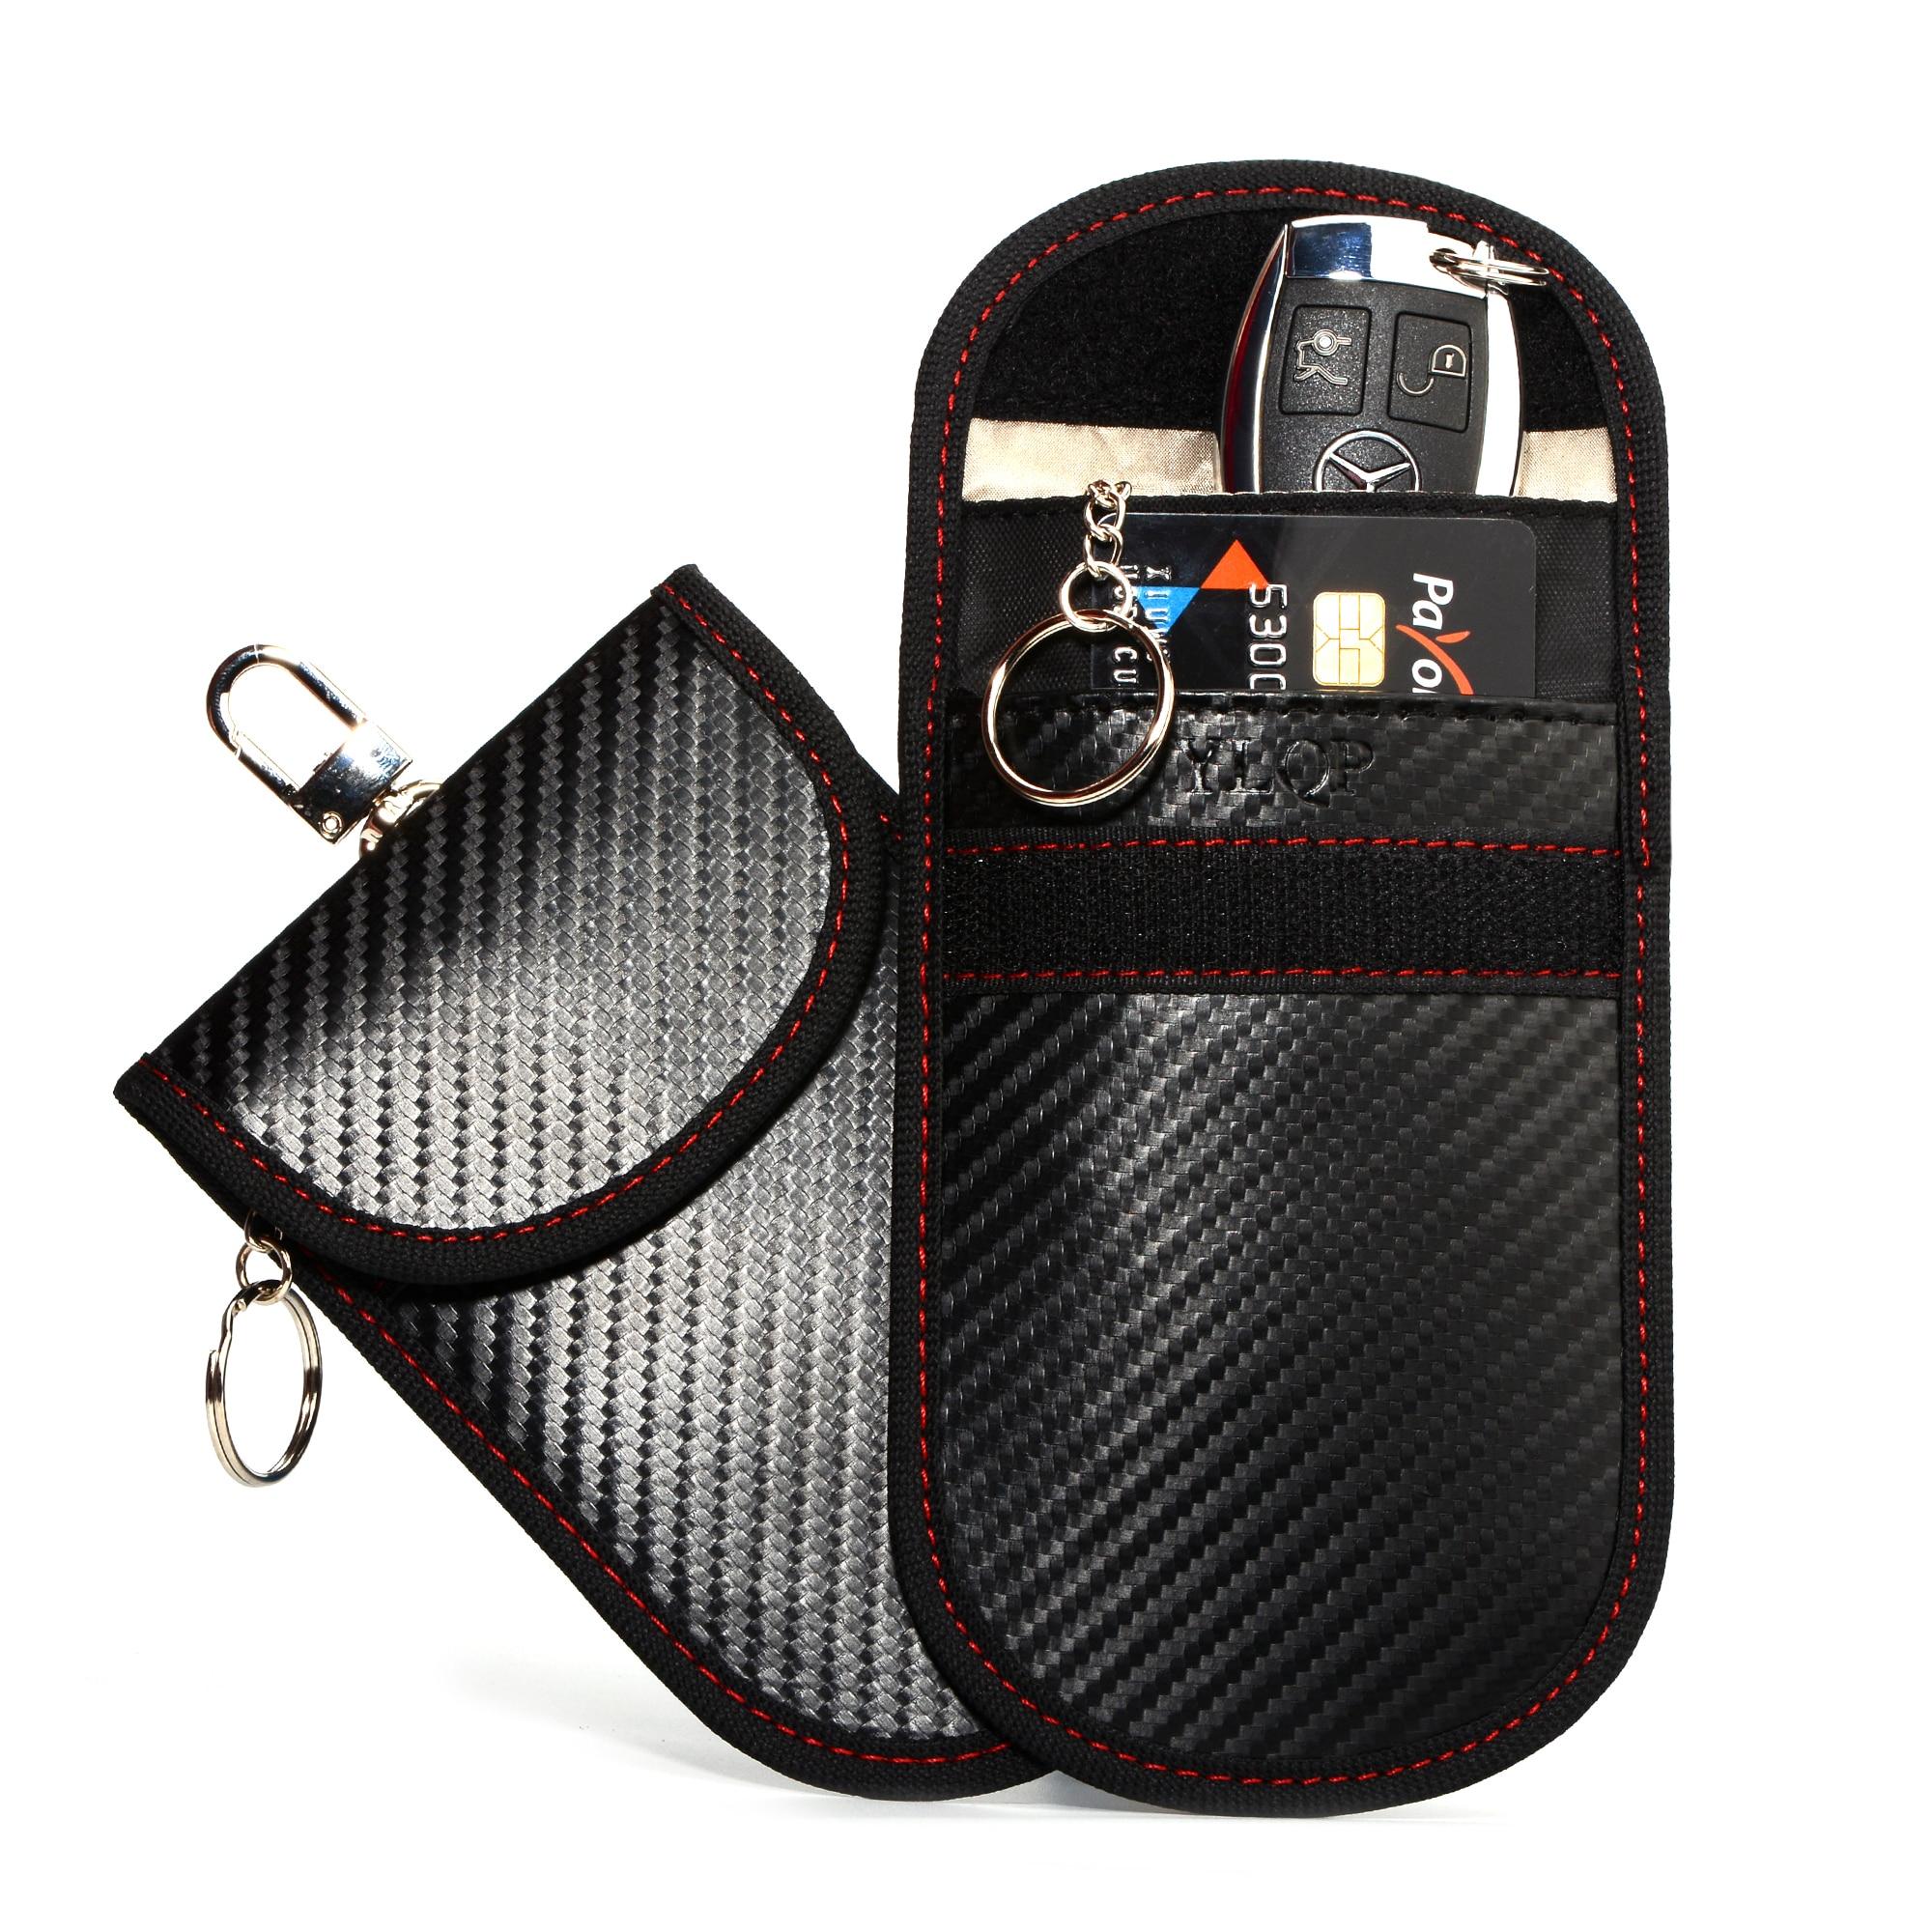 Faraday Cage Key Fob Protector RFID-Blocking Faraday Pouch Bag Car Key Holder Anti-Hacking Keyless Entry Signal Blocker Defender